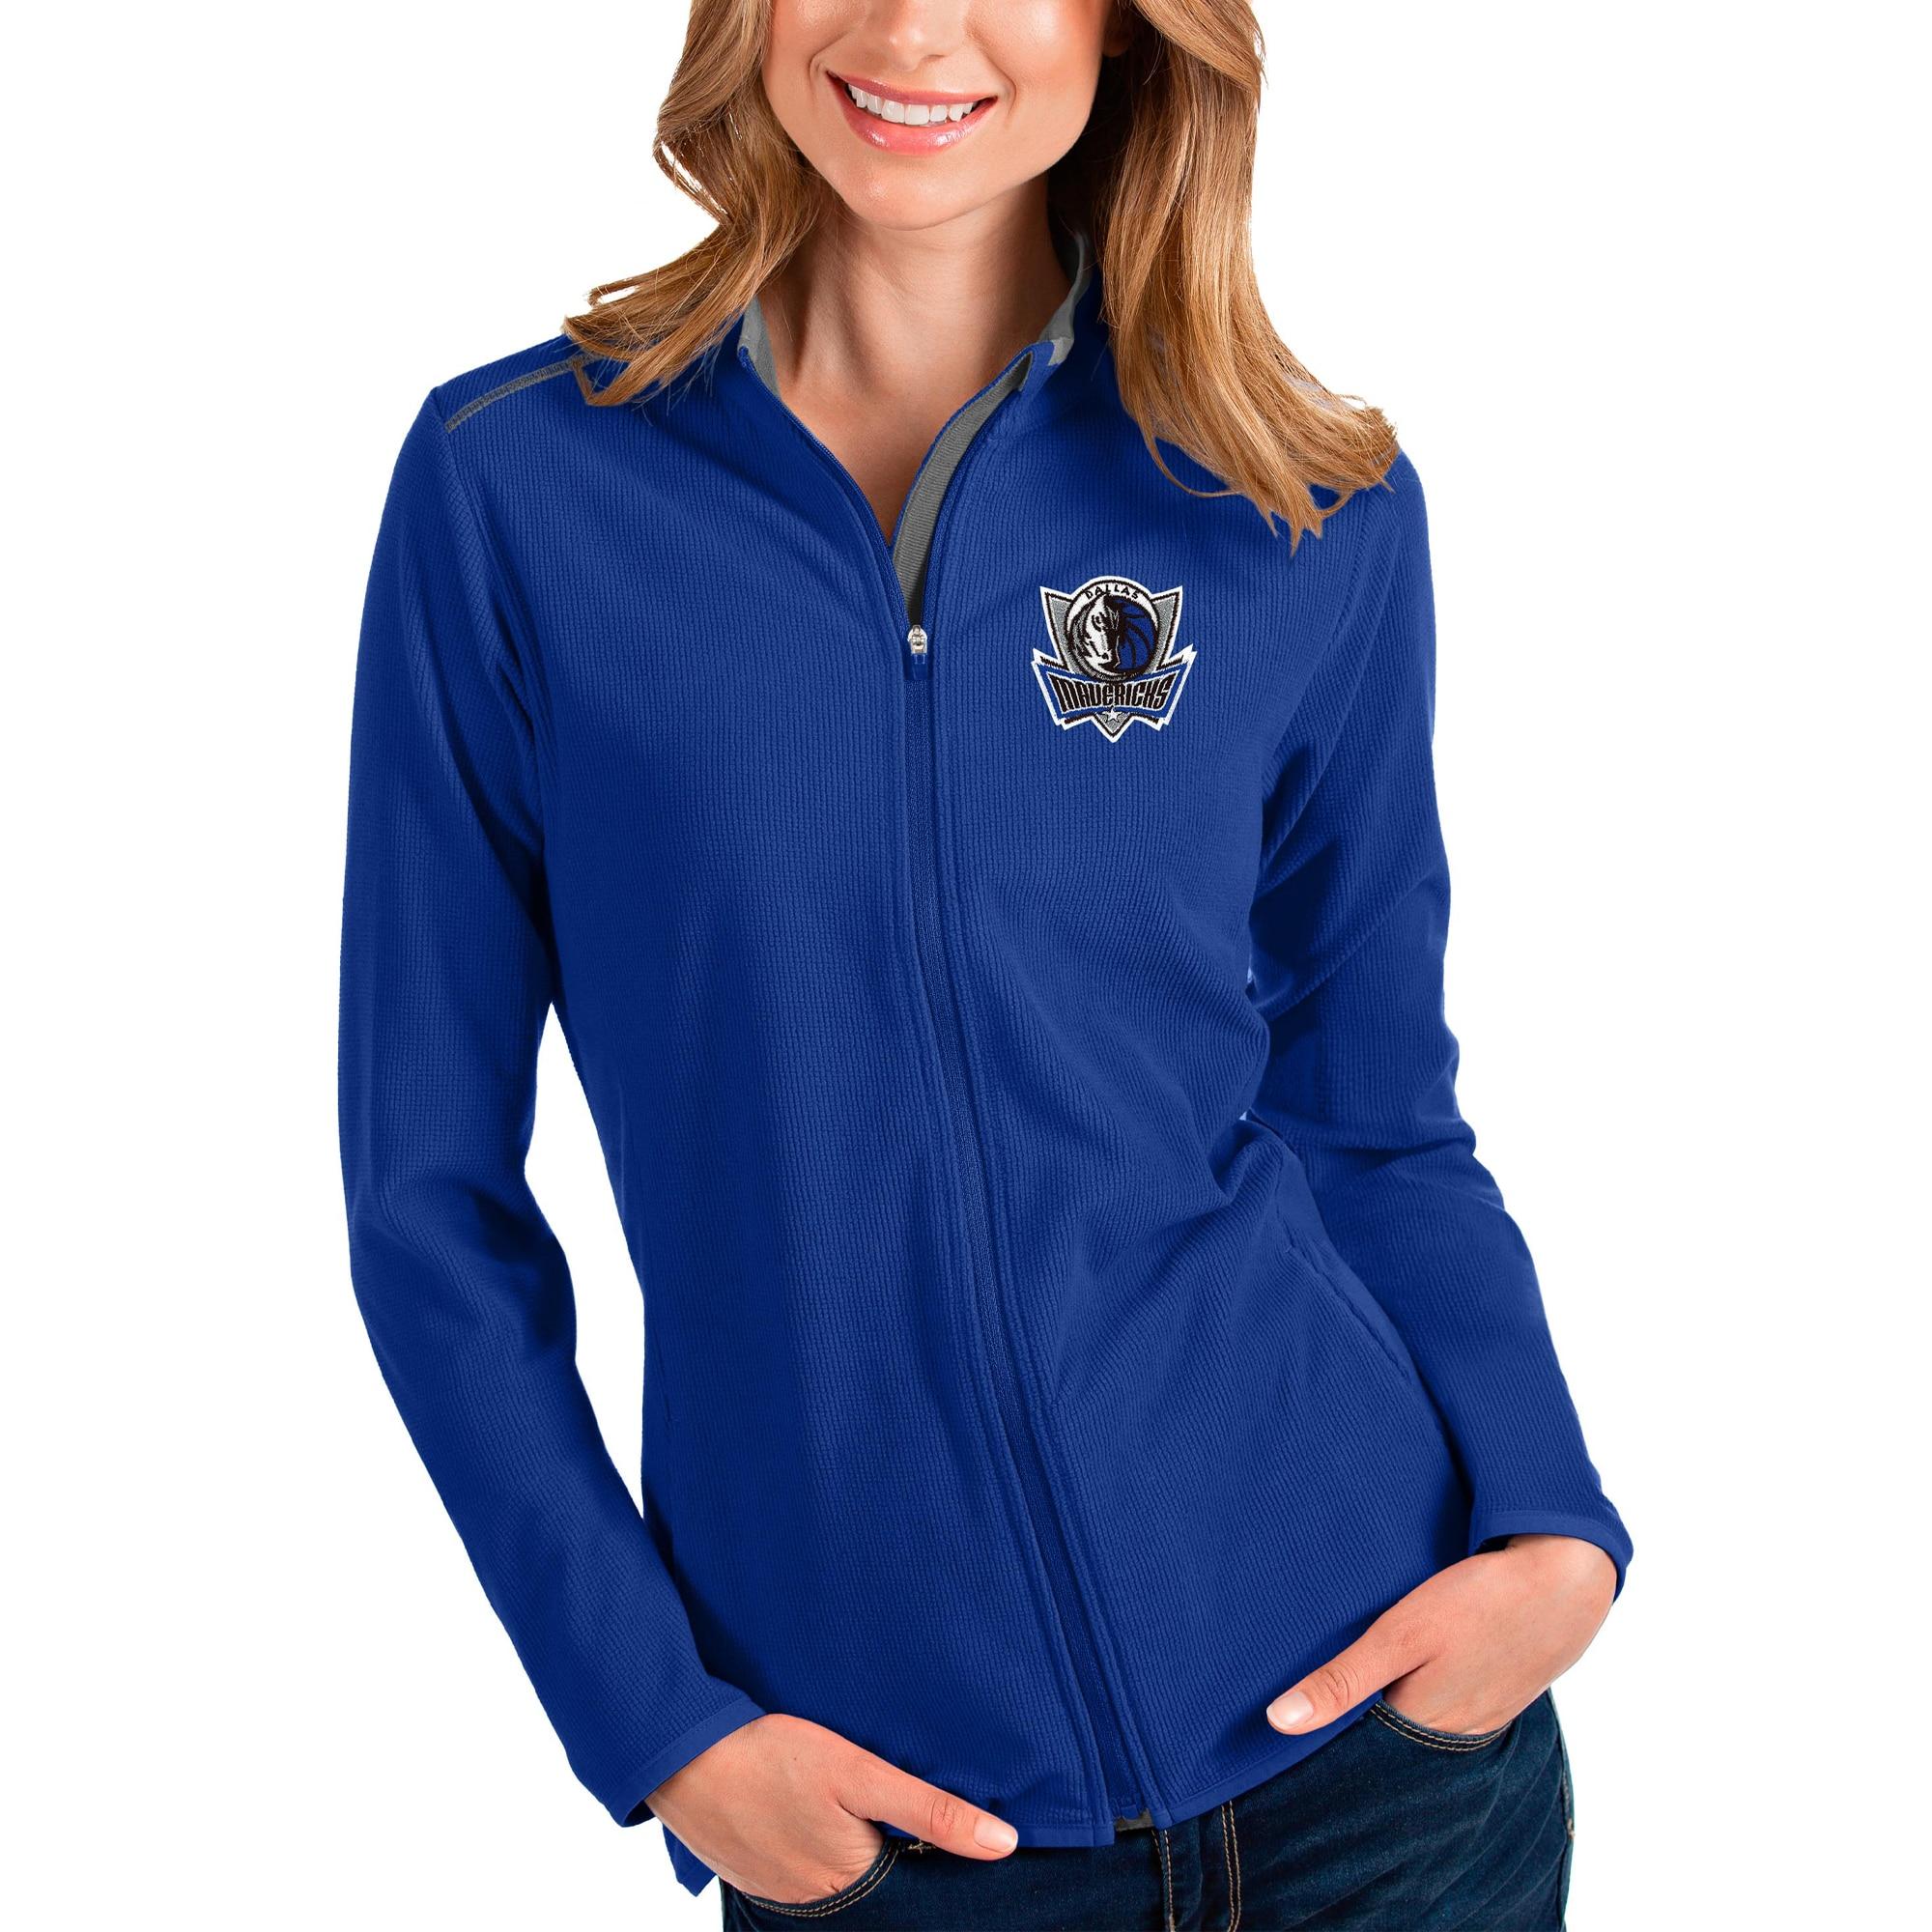 Dallas Mavericks Antigua Women's Glacier Full-Zip Jacket - Royal/Gray